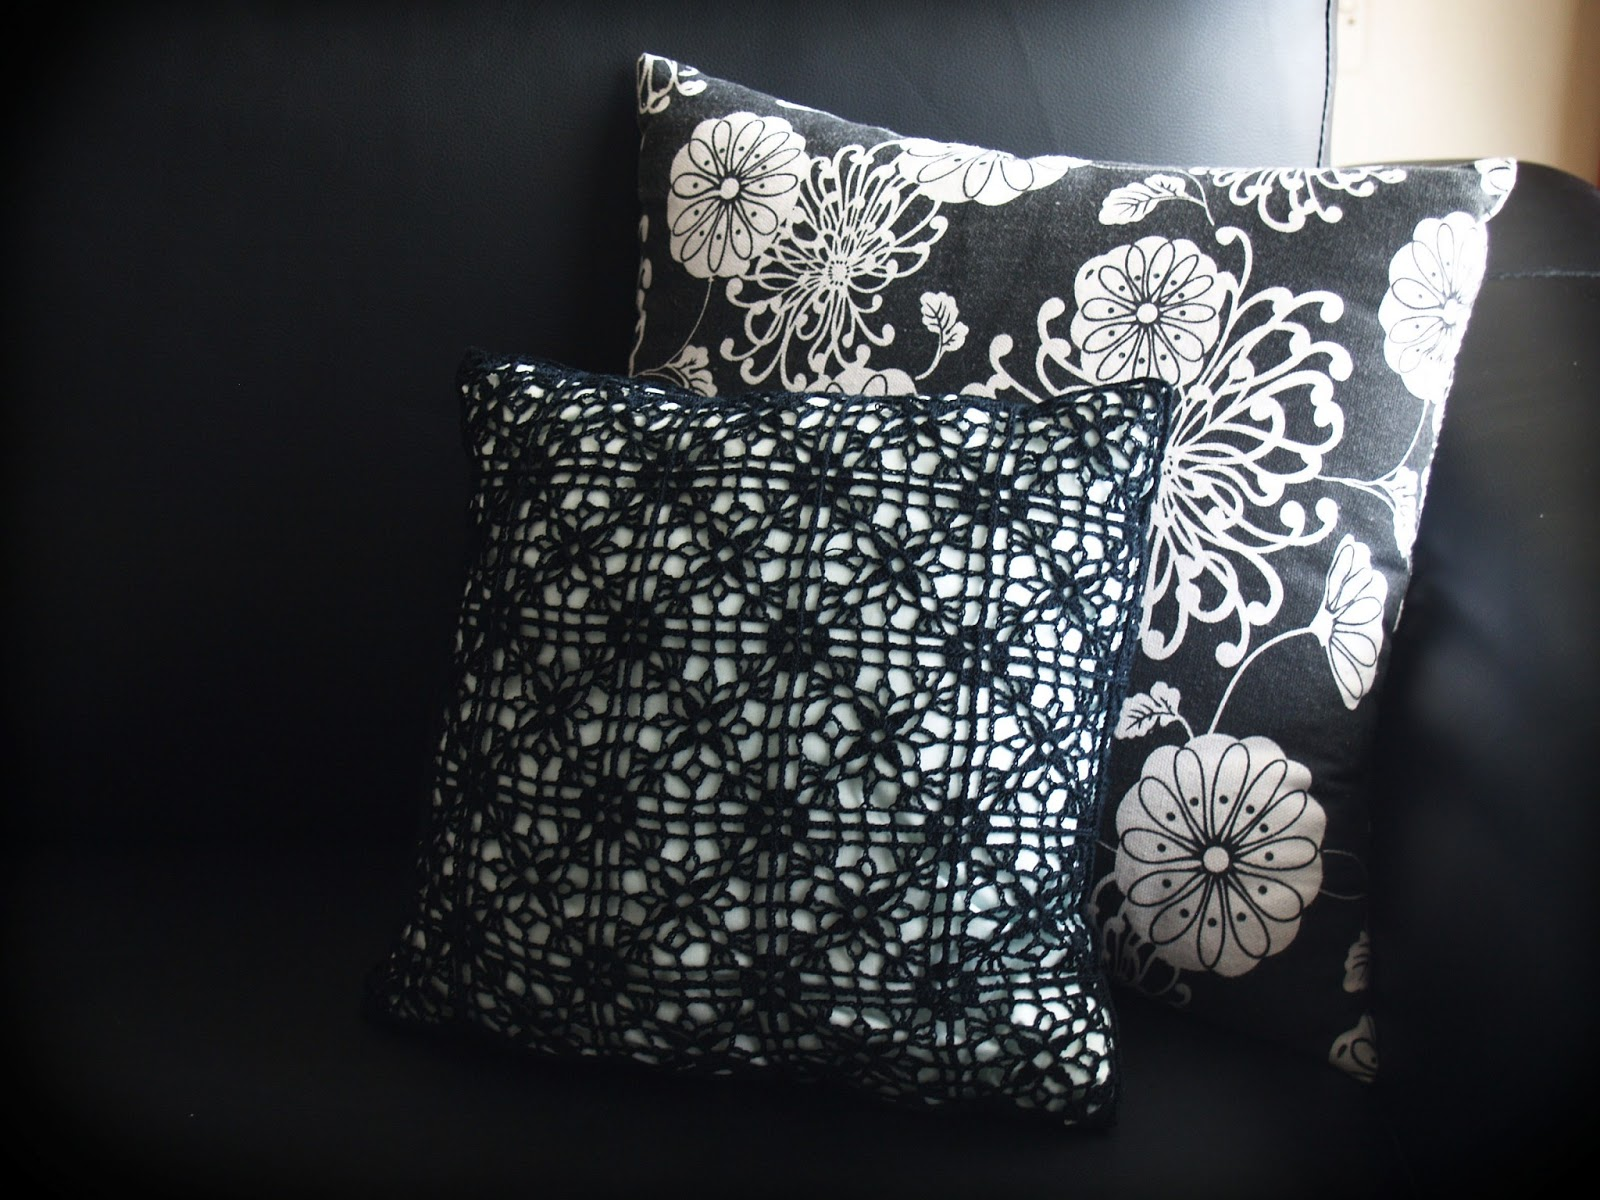 crochet sofa cover patterns cushions for sofas the various choices howsanne handmade pillow decor